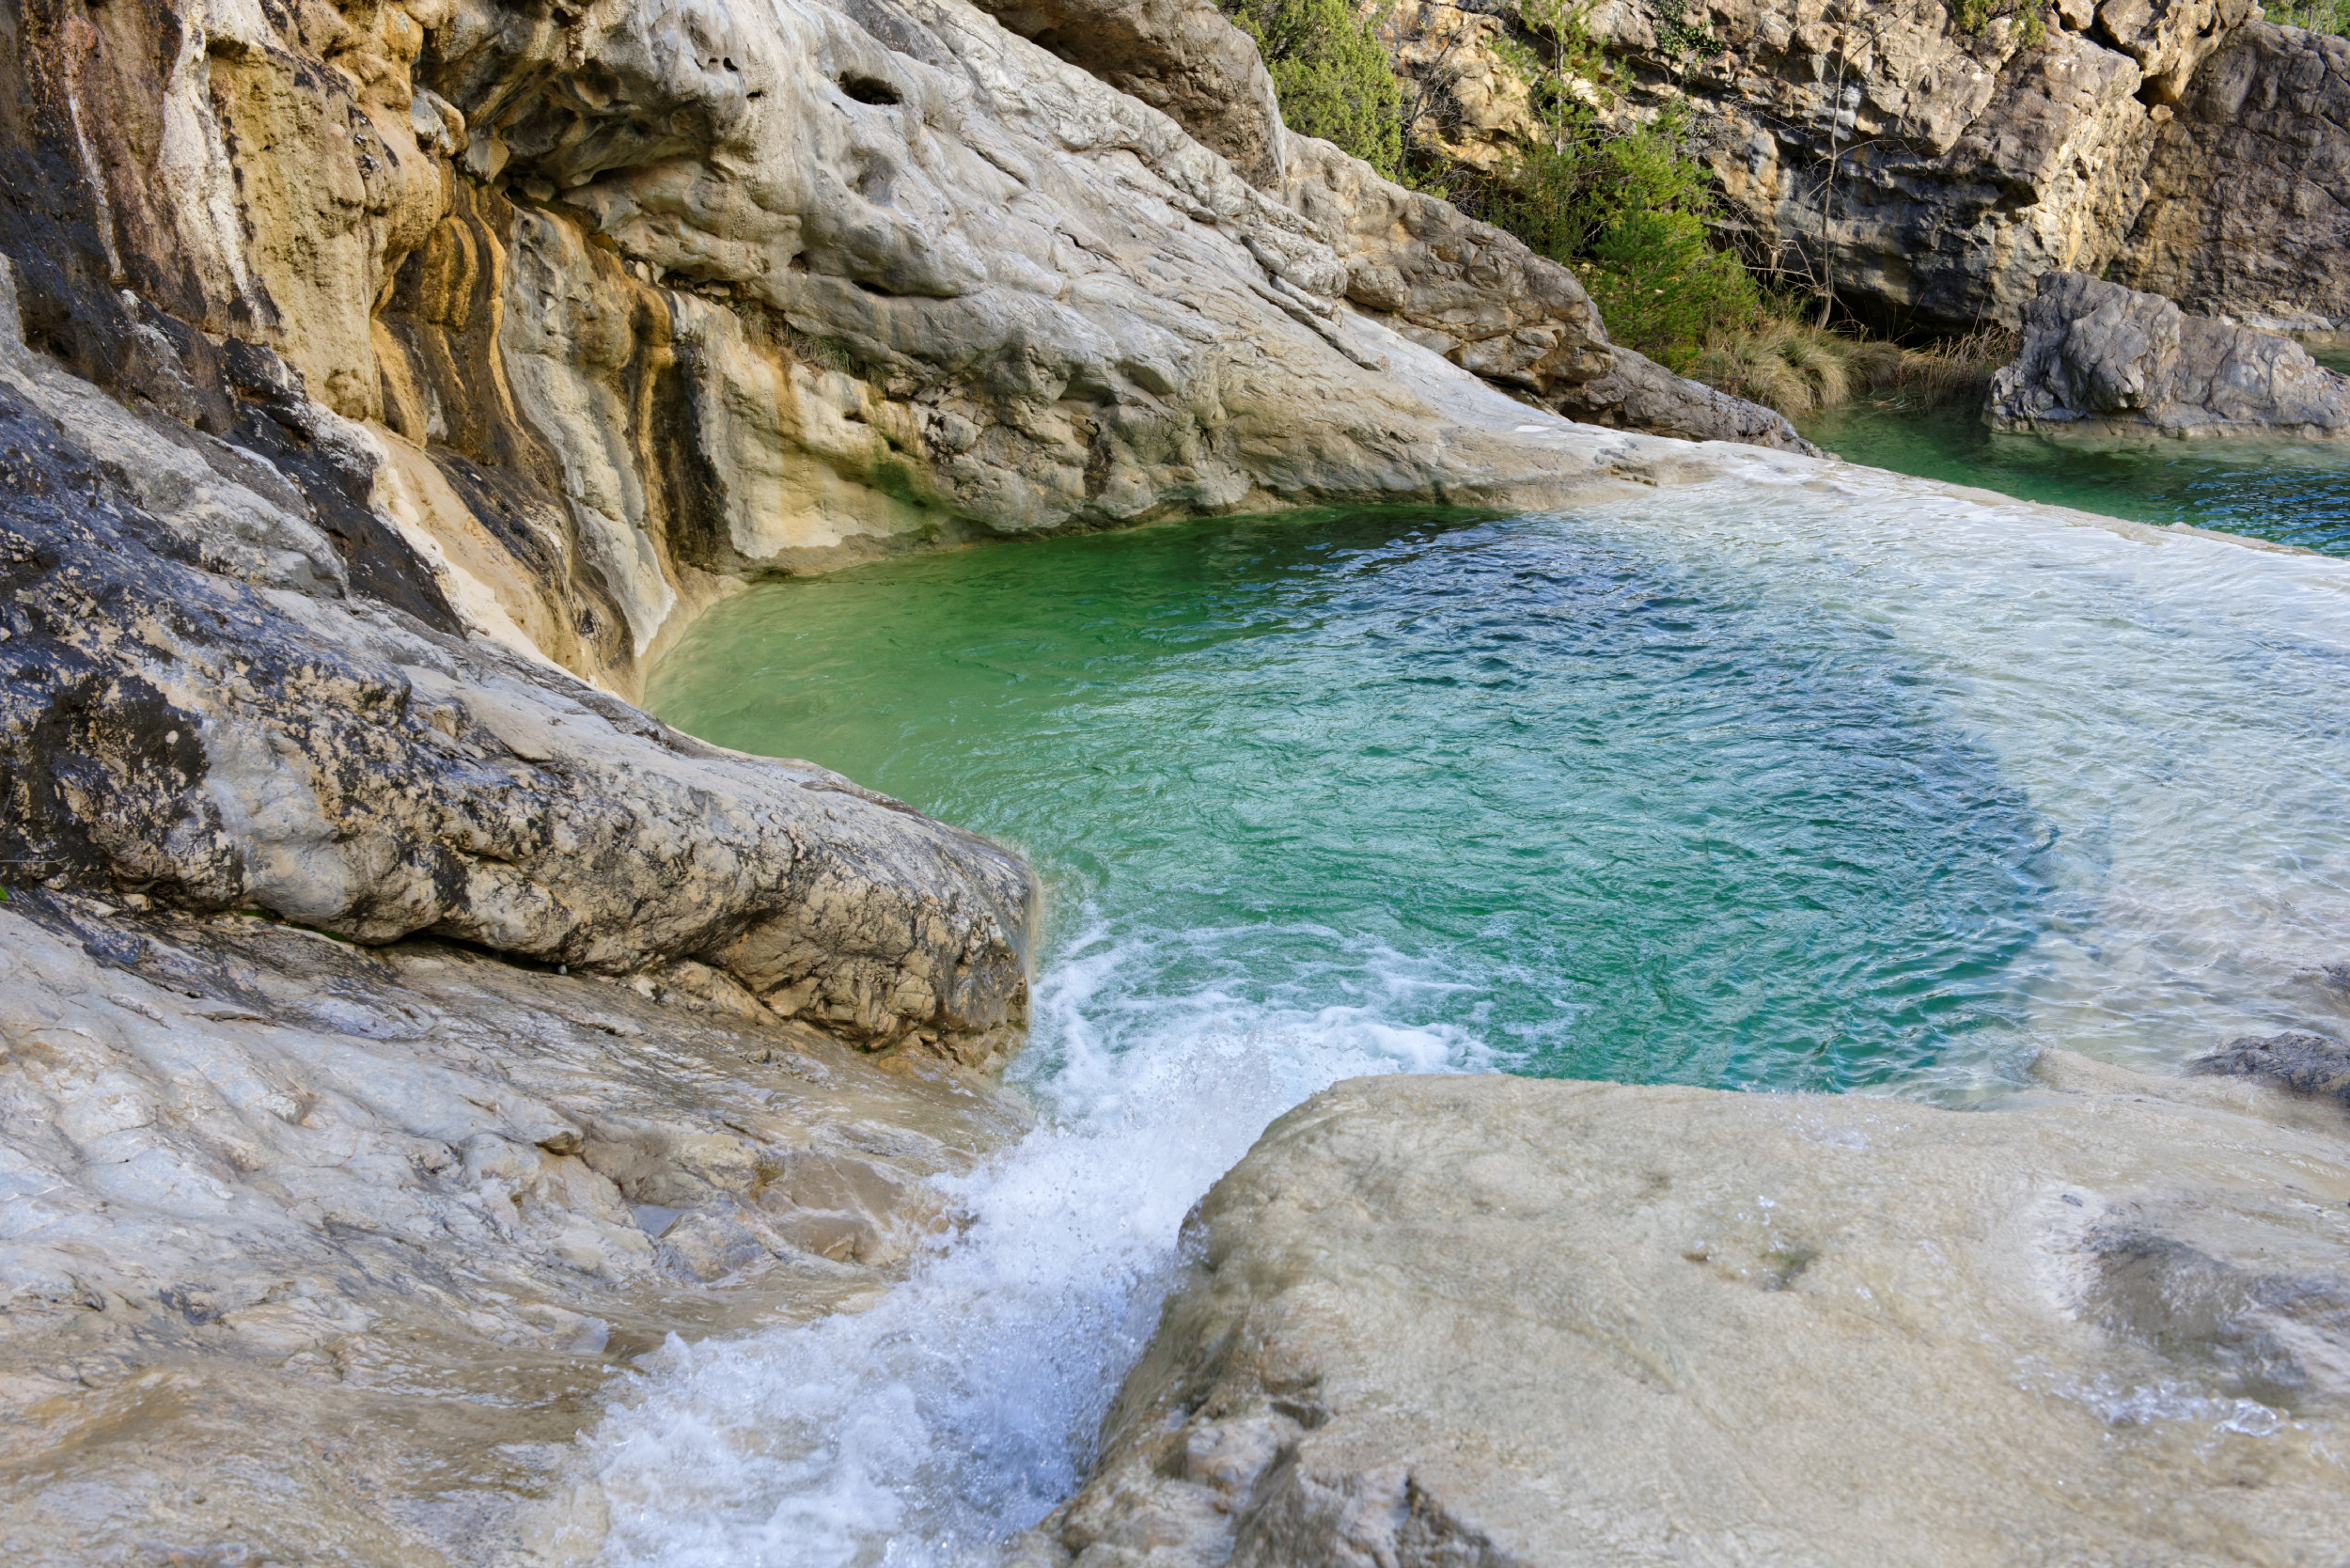 141208-Sieste - Canyon et Barranco (Sobrarbe) (39)